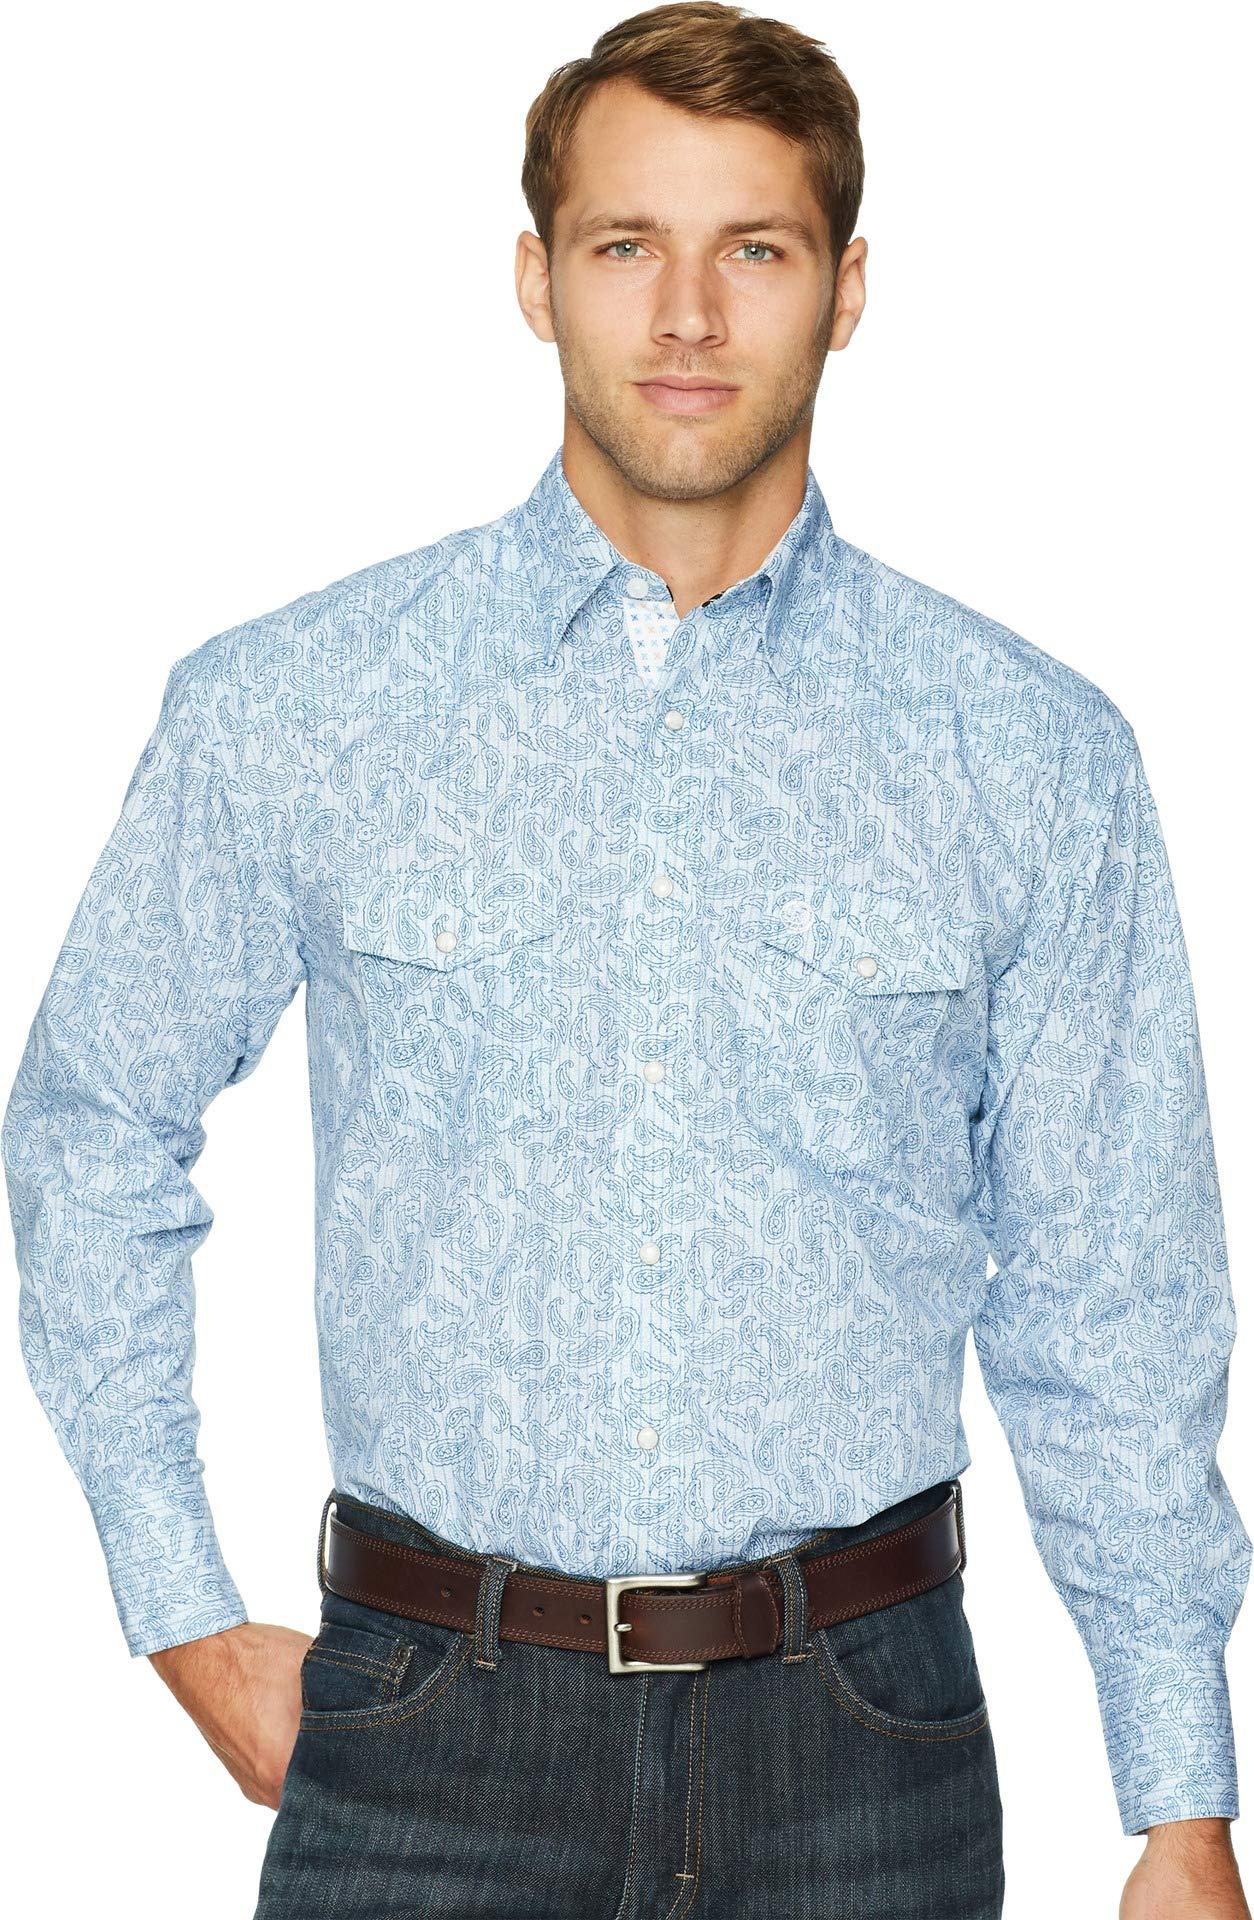 Wrangler Men's George Strait Blue Paisley Print Shirt Blue Large